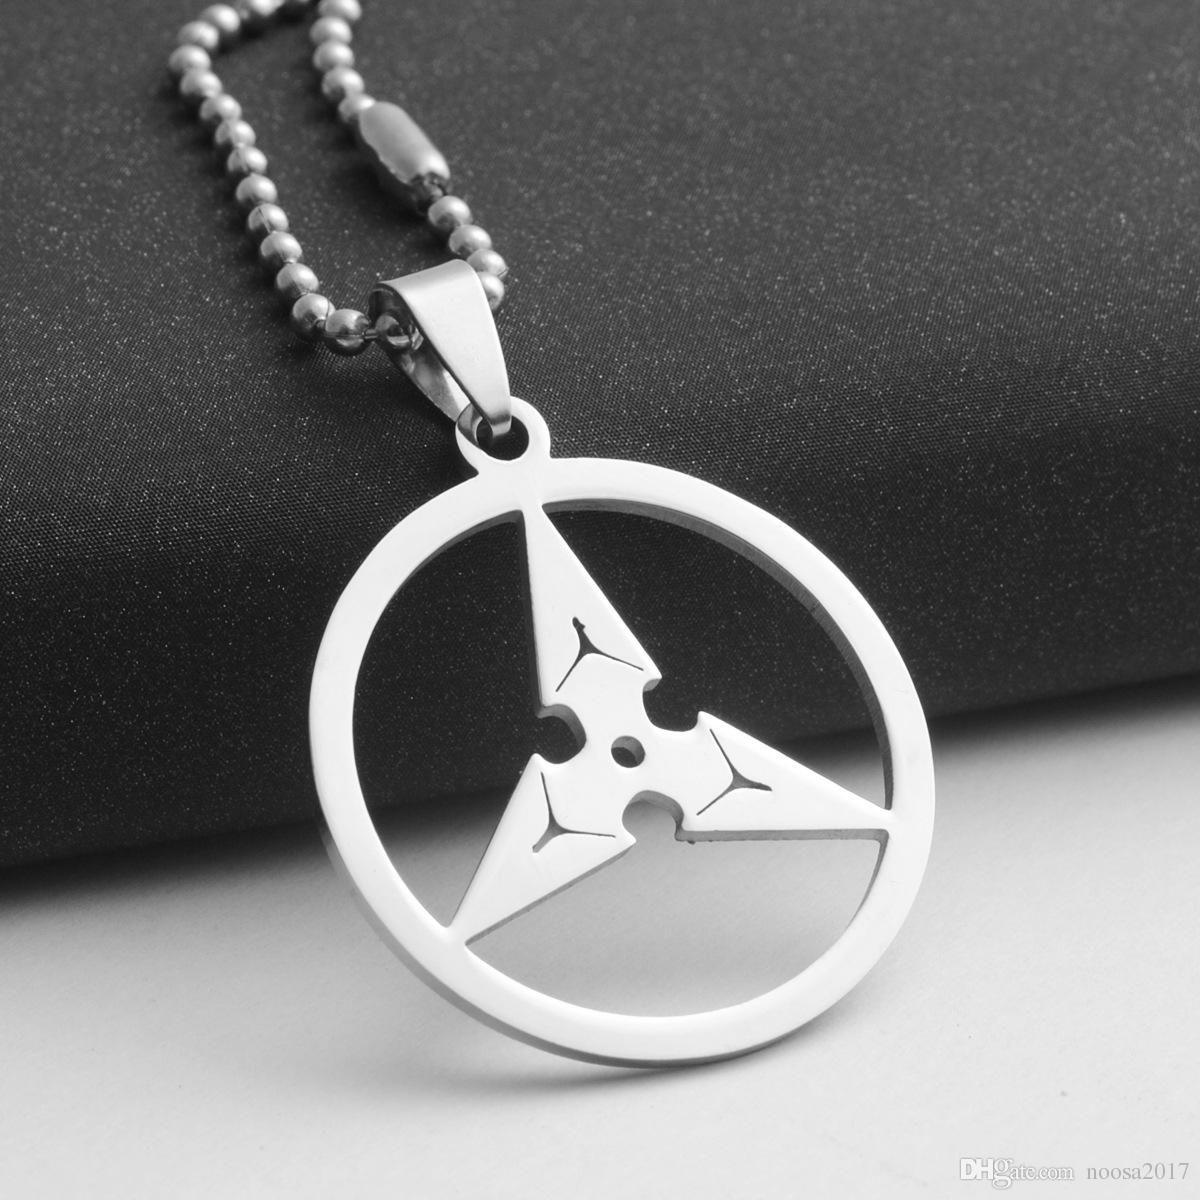 Charm Necklaces Men's Necklace Titanium Steel Pendant Stainless Steel Watch Pioneer Dart Pendant Necklace Fashion DIY Jewelry Decoratio